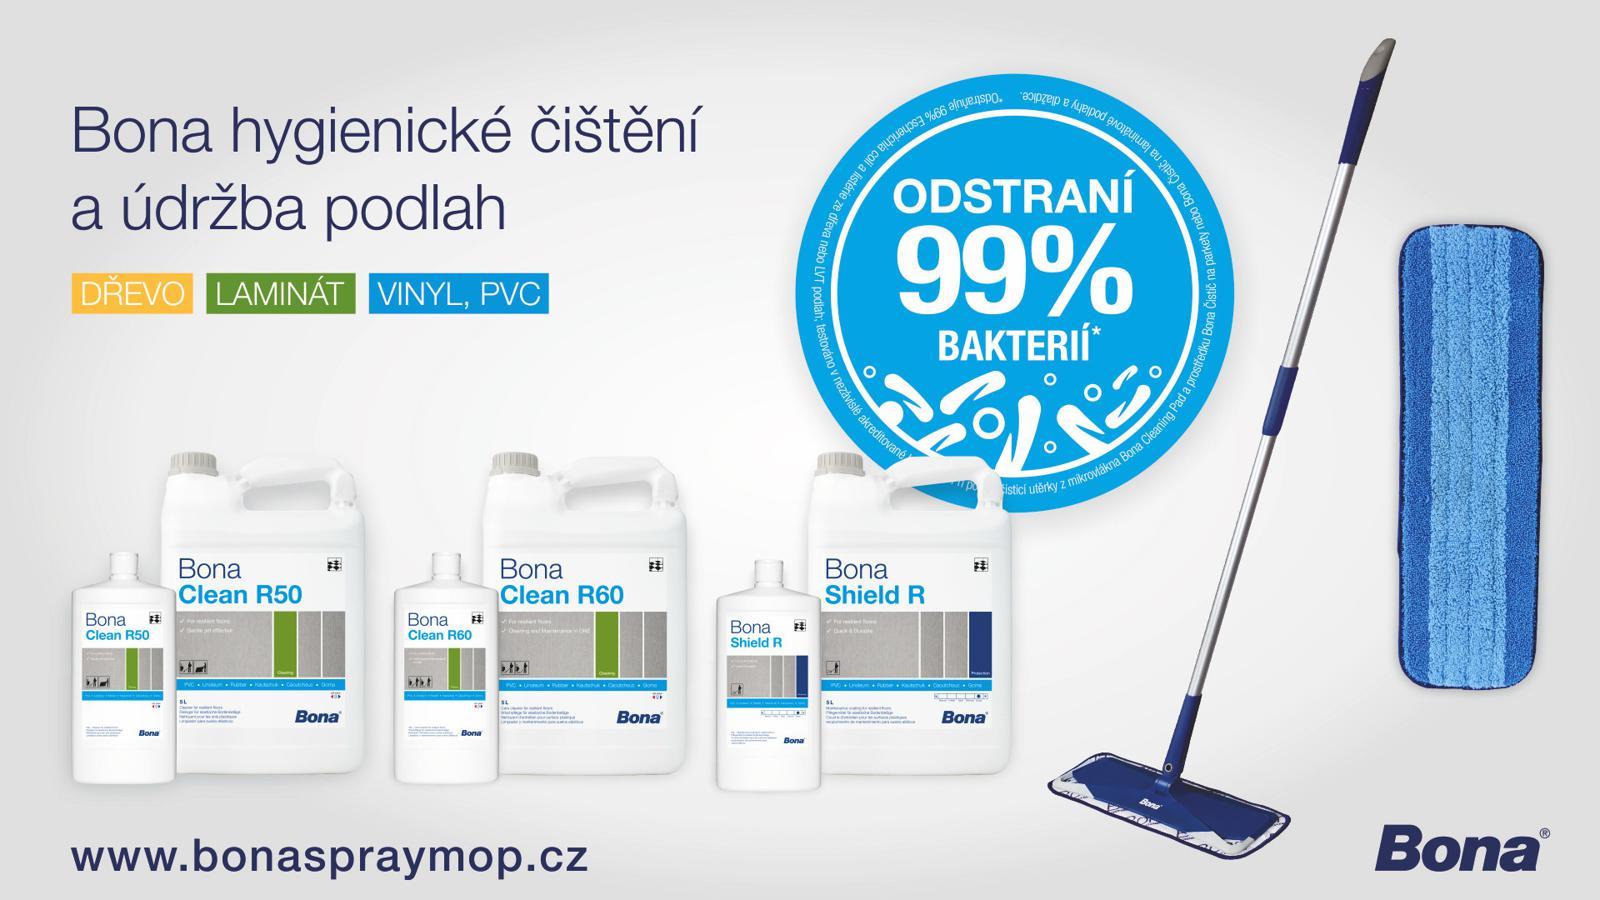 bona mop 99% odstrani bakterii